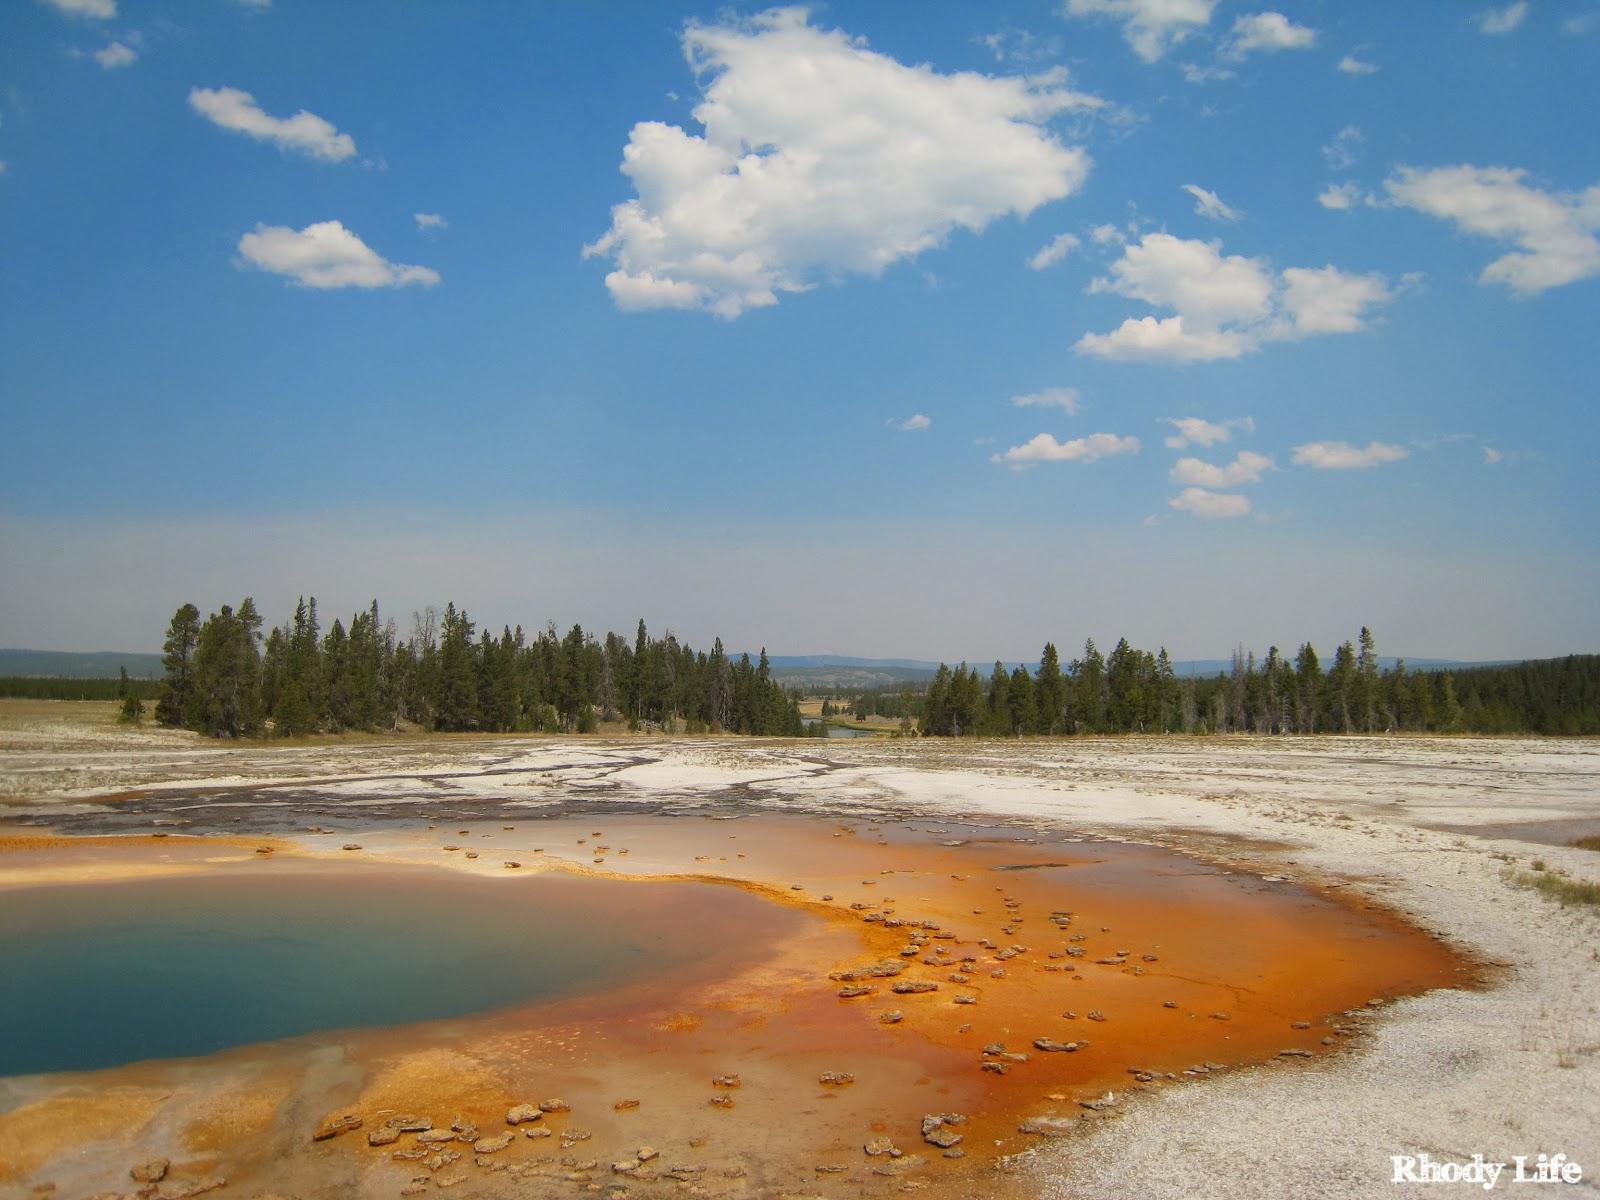 Rhody Life September - Us national parks yellowstone